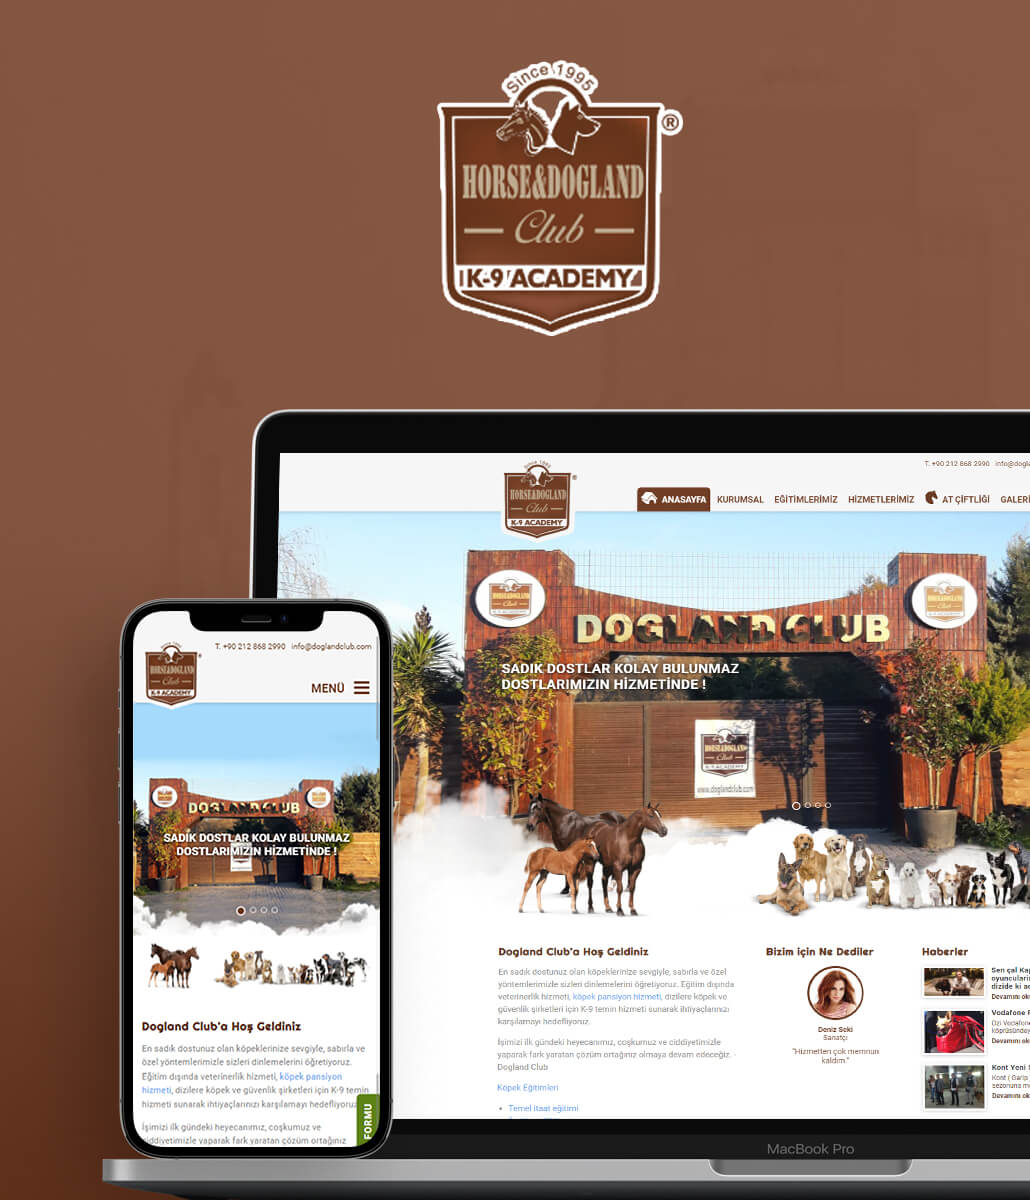 Horse & Dogland Club İnternet Sitesi